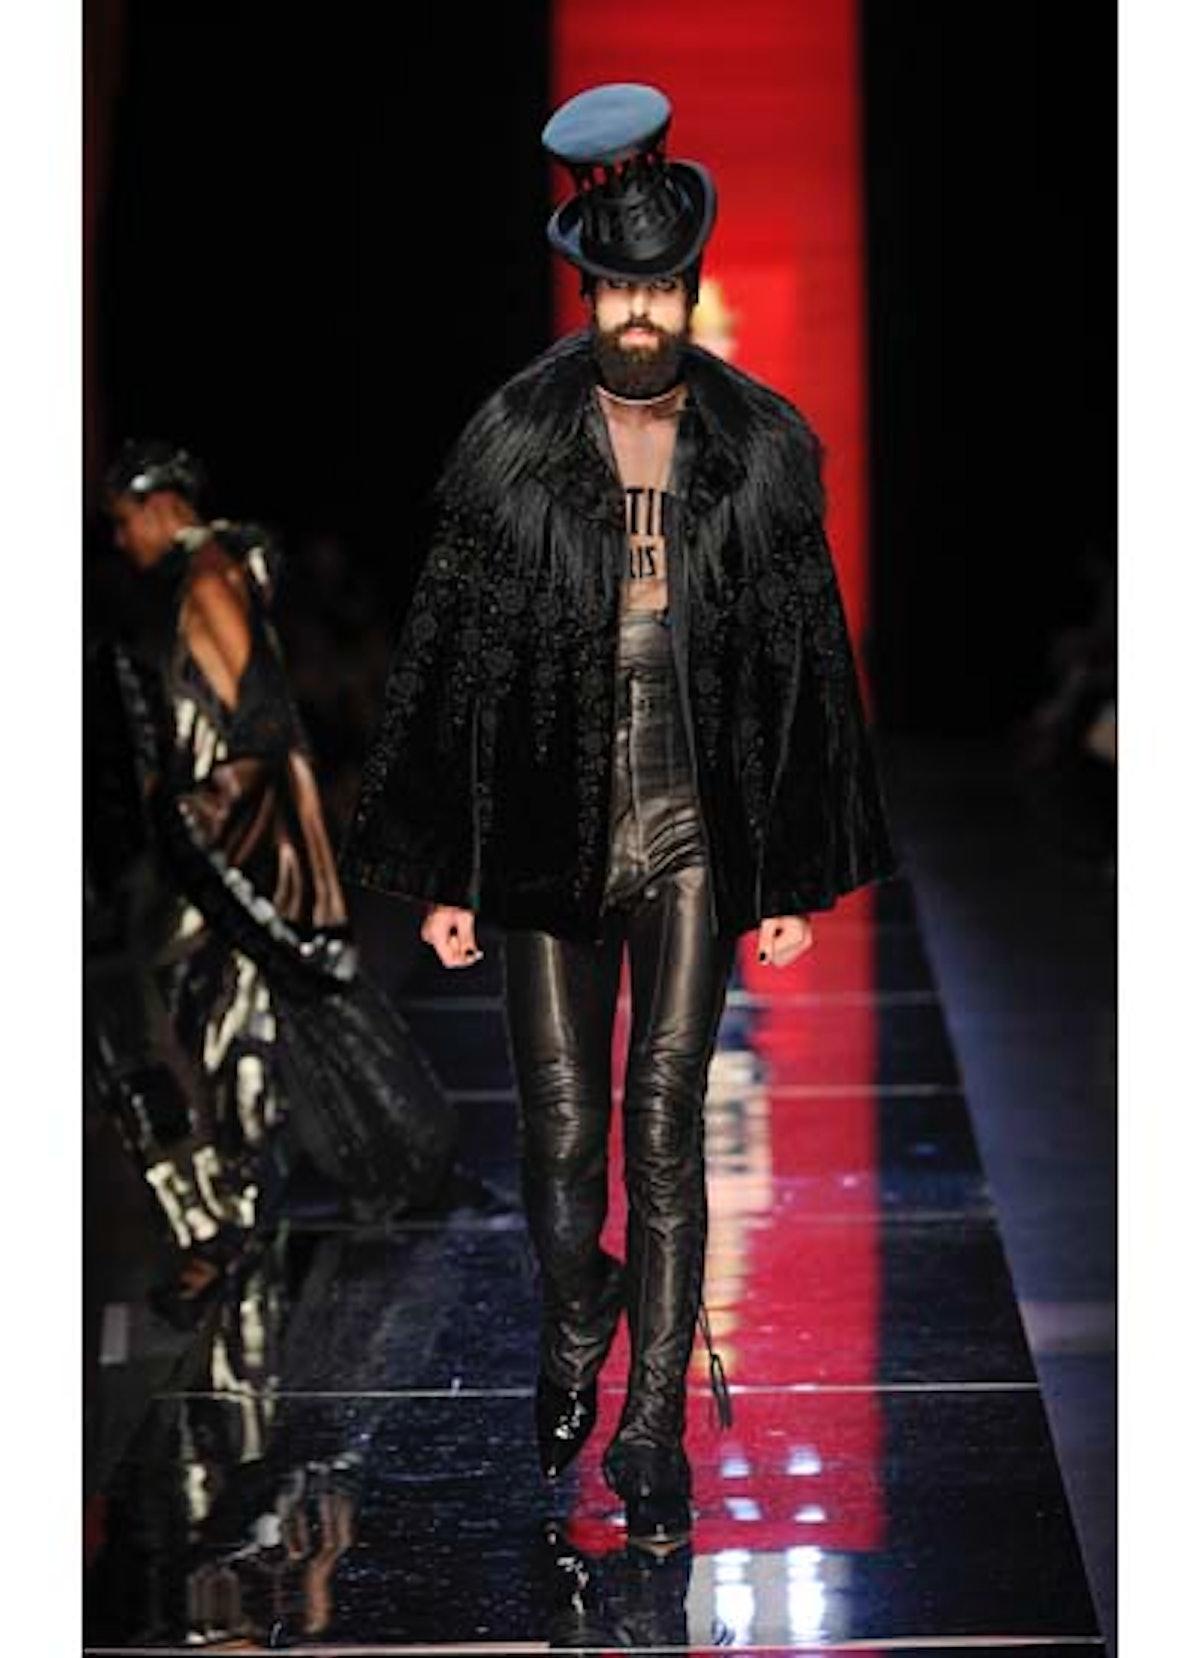 fass-jean-paul-gaultier-couture-2012-runway-45-v.jpg